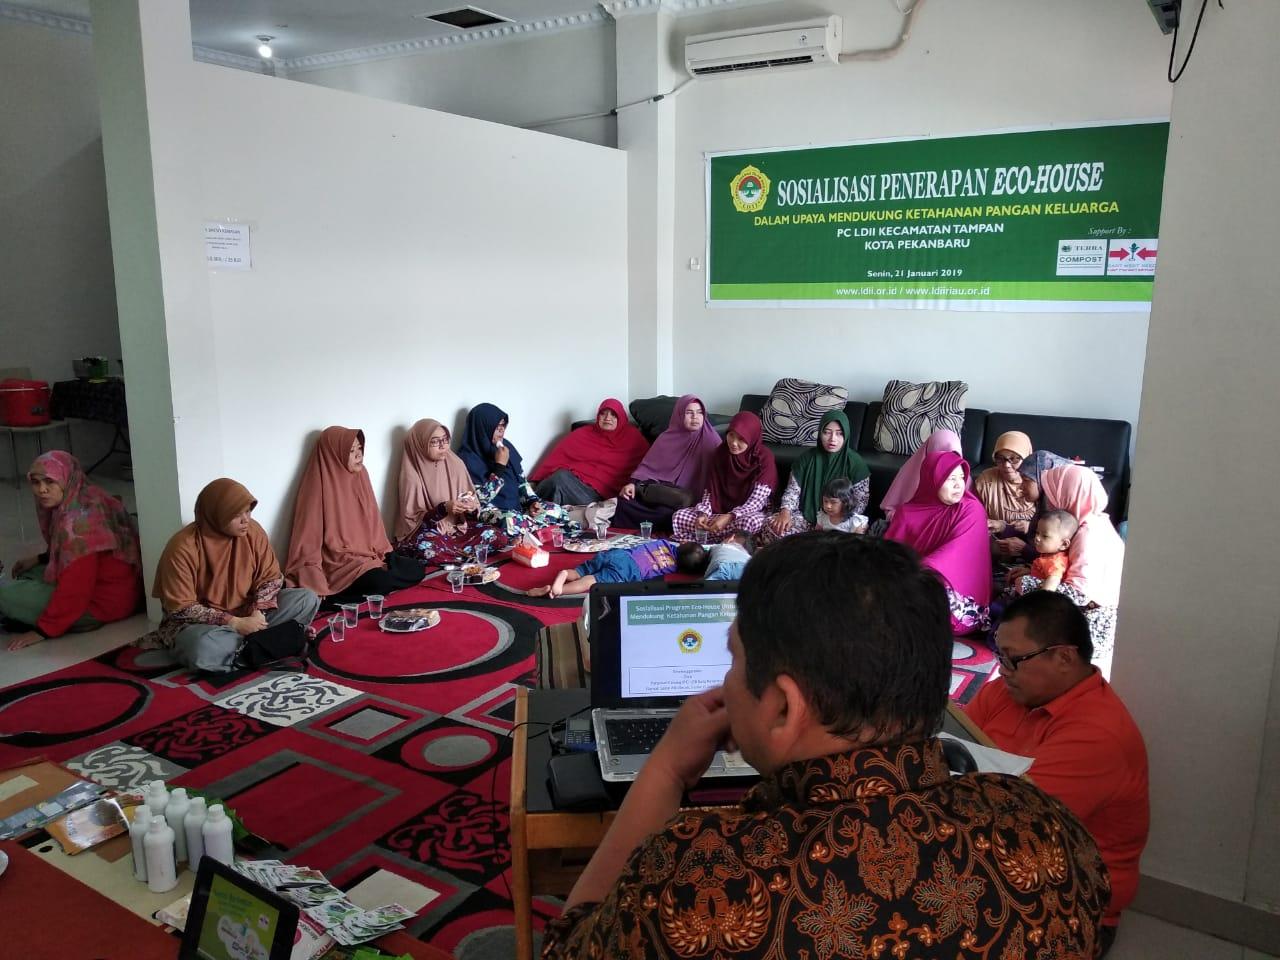 LDII Riau Sosialisasi Penerapan Eco-House Bersama PT Ewindo dan Terra Compost